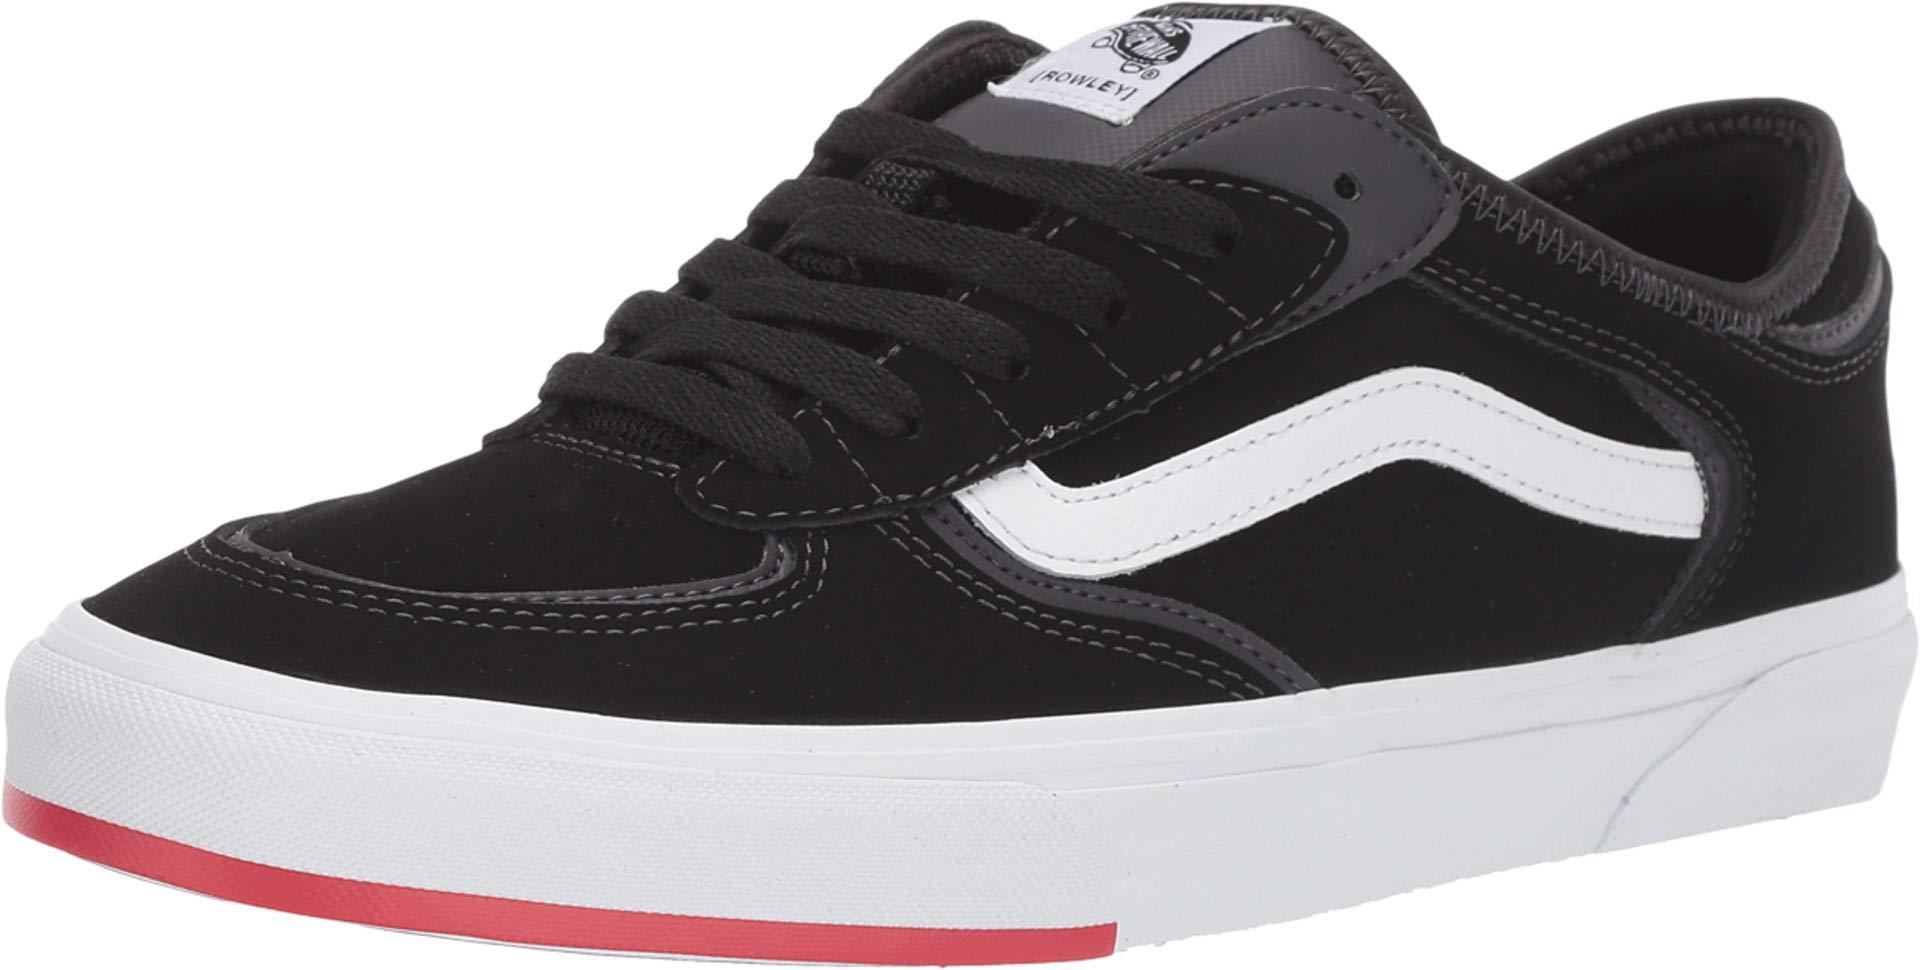 Vans Unisex Rowley Classic Skate Shoes (14.5 Women/13 Men, (66/99/19) Black Red) by Vans